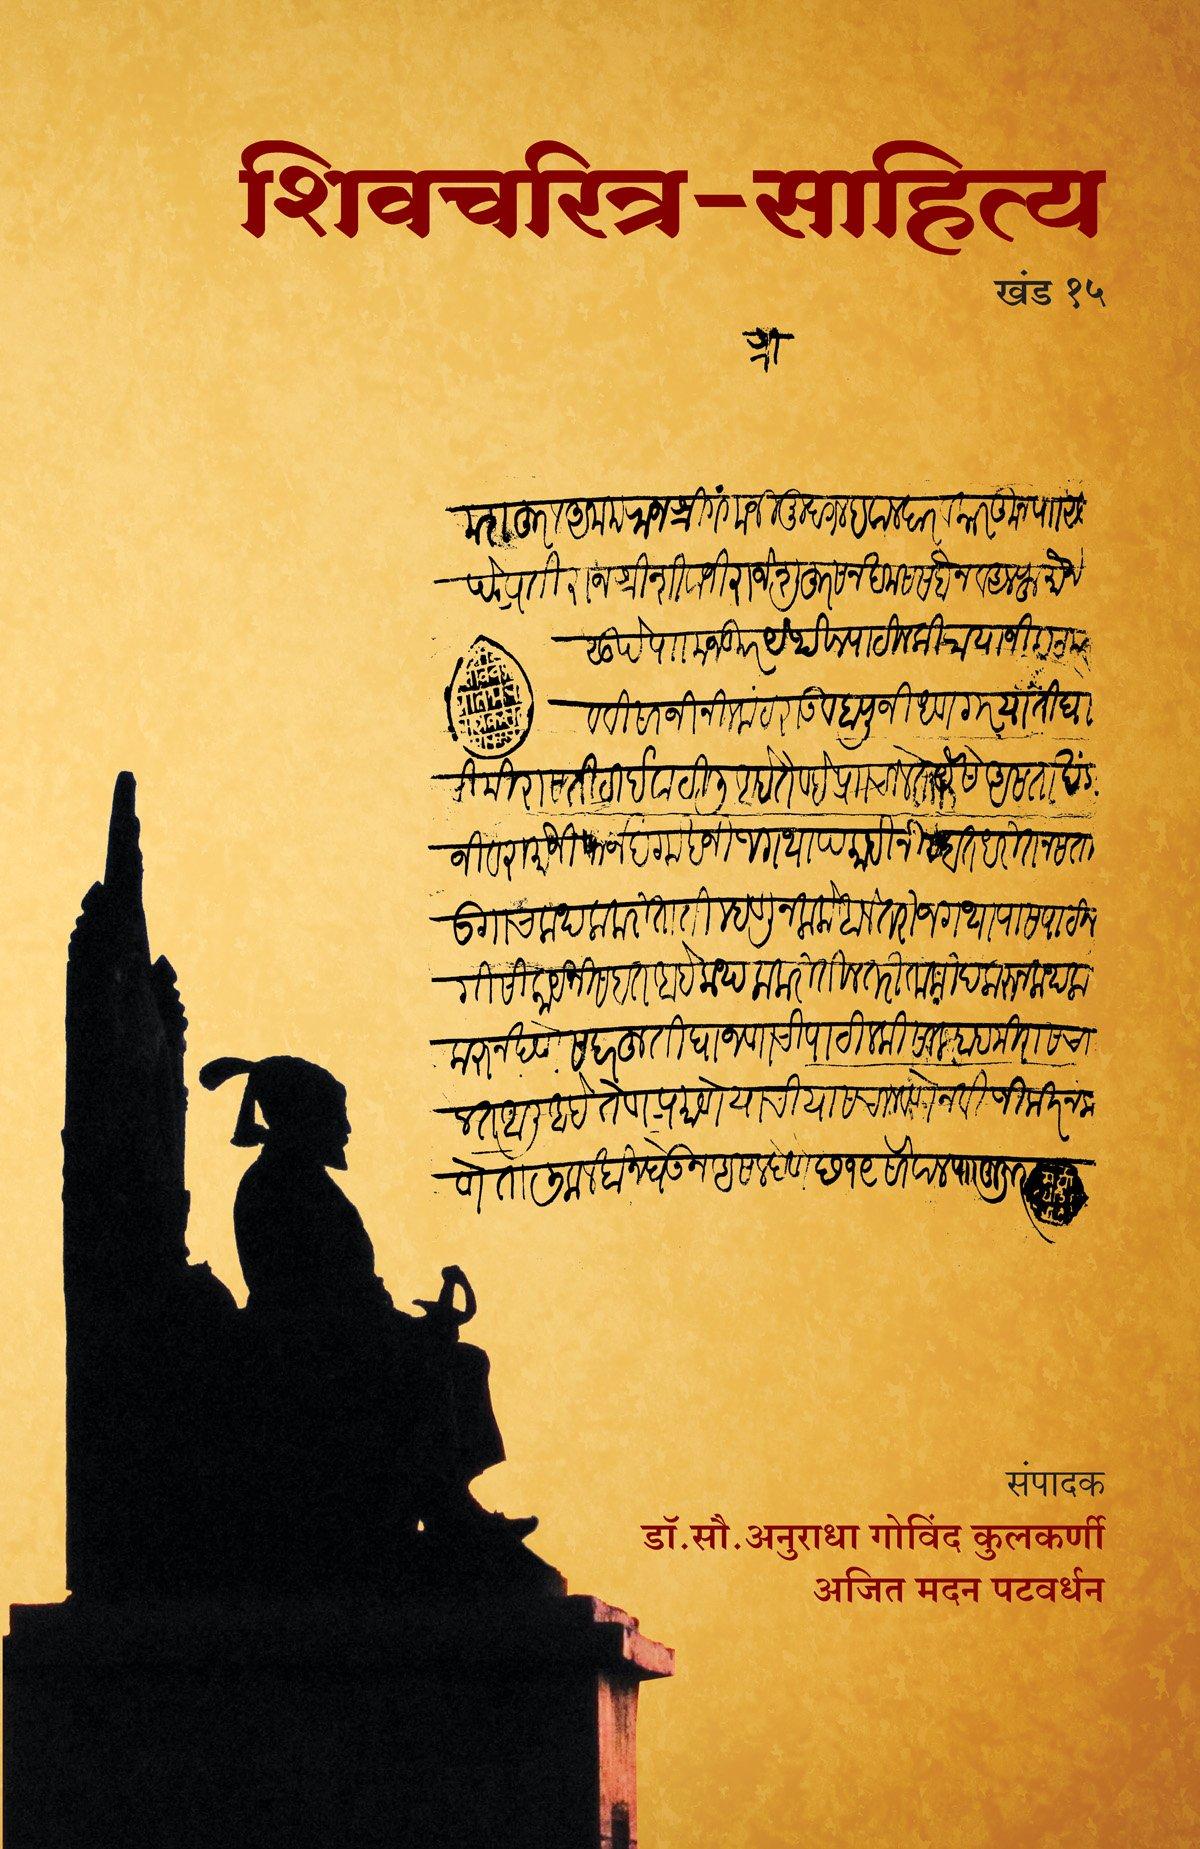 Shiv charitra pdf free 33golkes nectur.